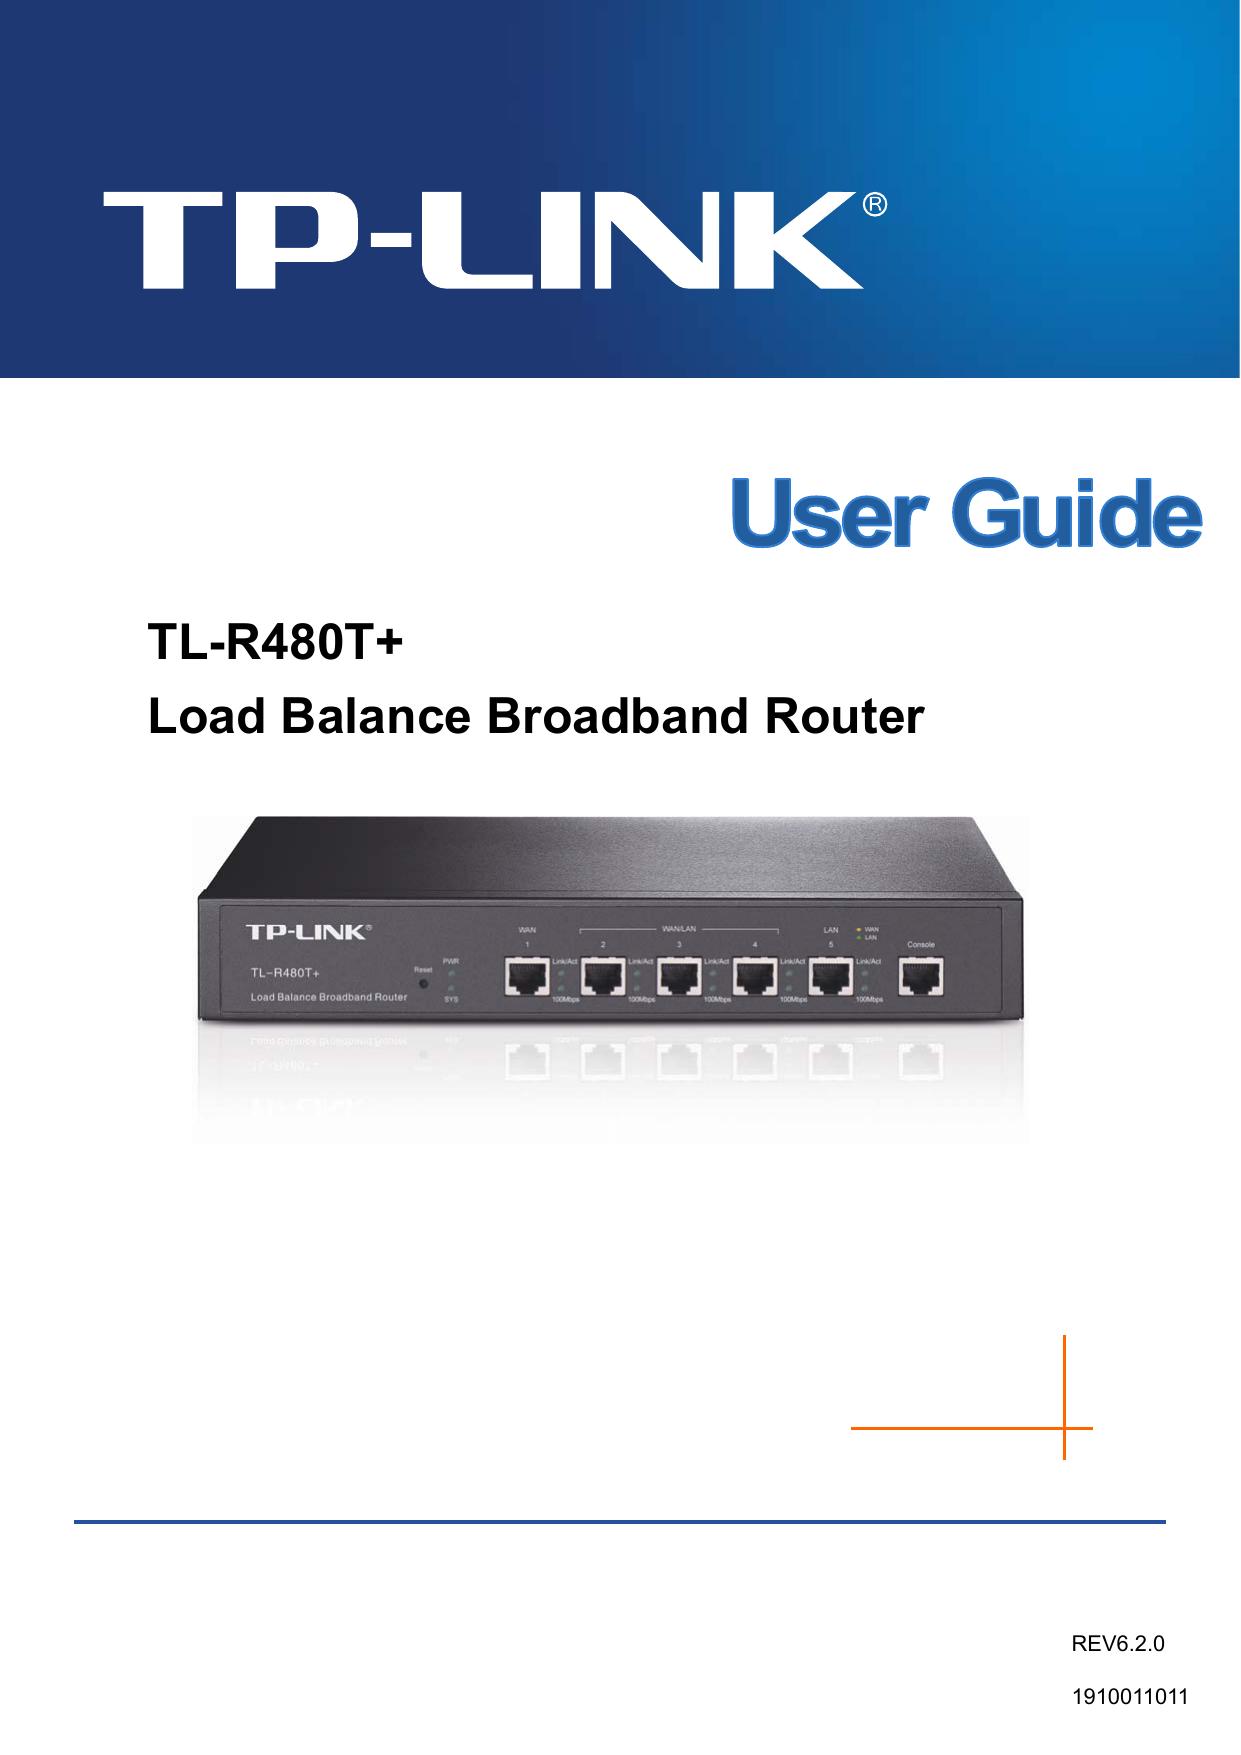 TL-R480T+ Load Balance Broadband Router - TP-Link